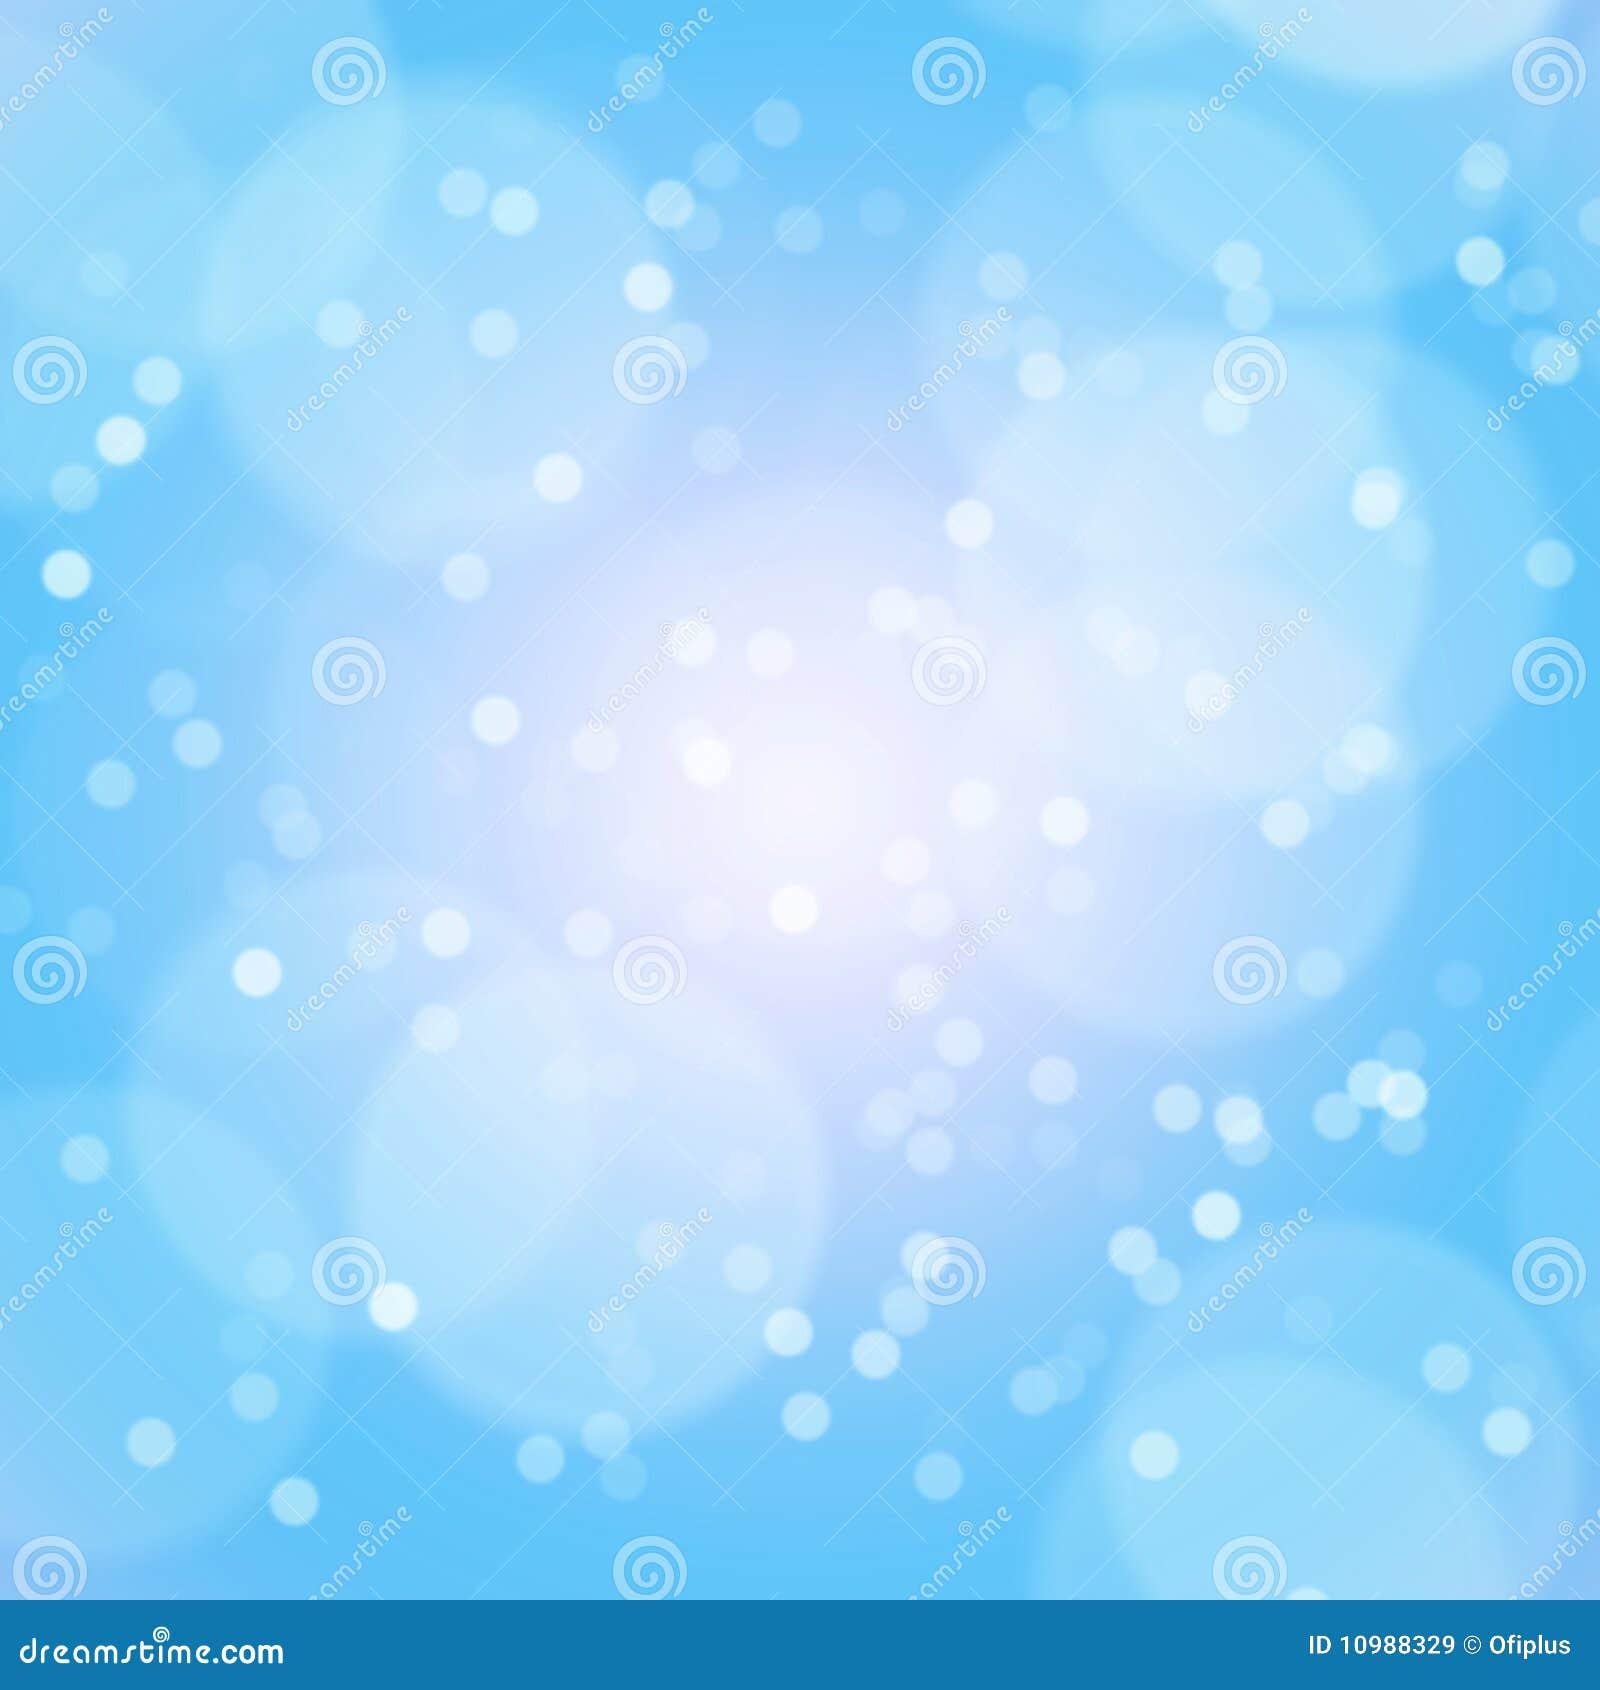 Blue light background stock image. Image of design, glow ...